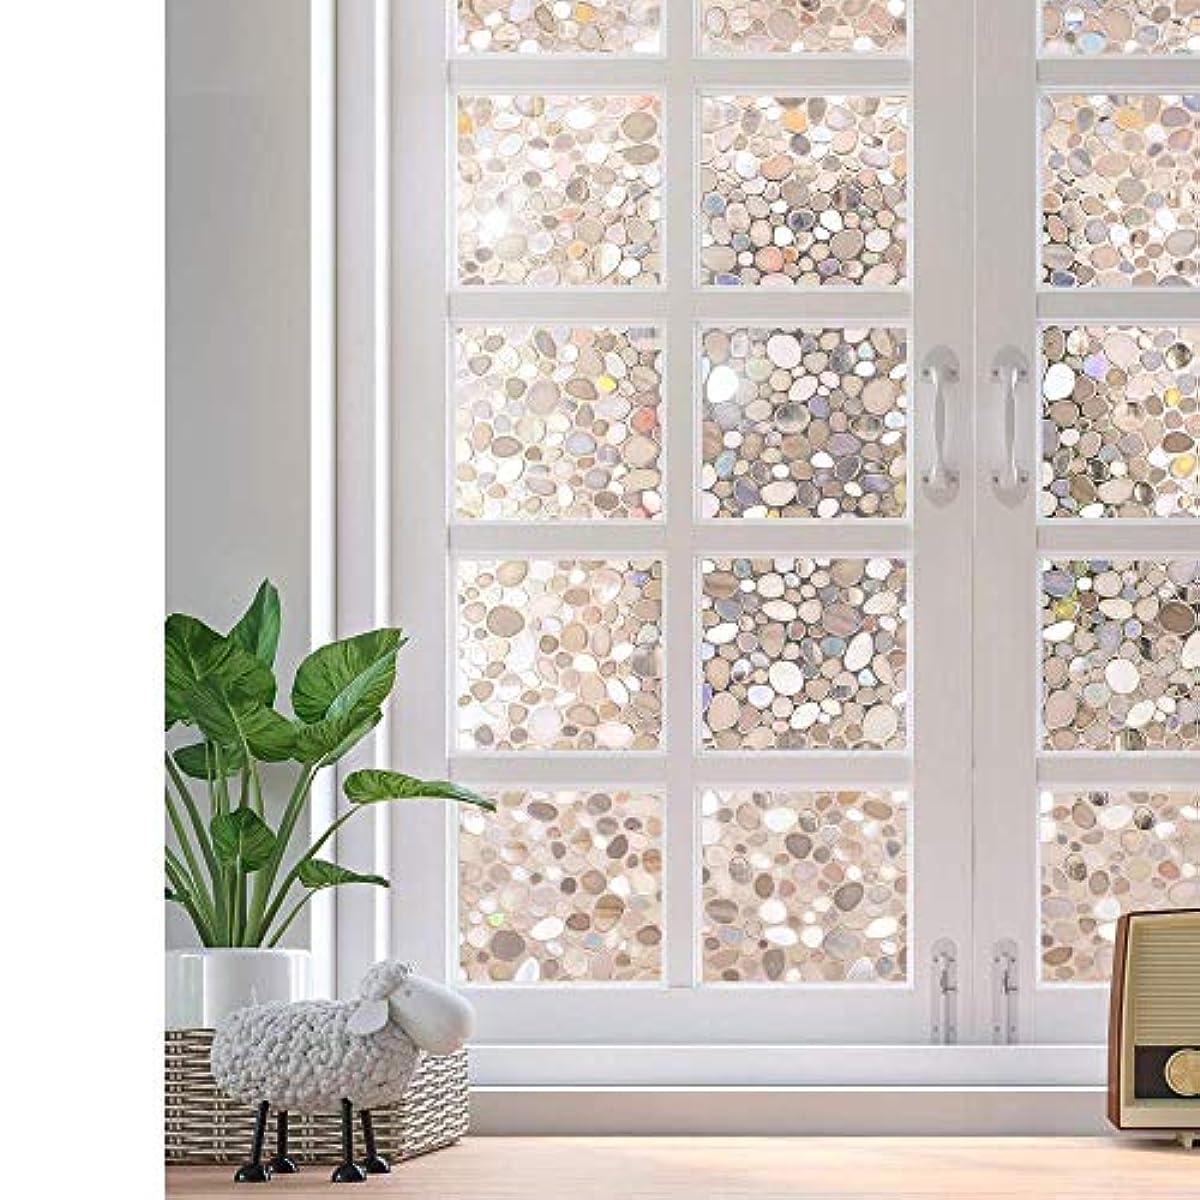 Rabbitgoo Fensterfolie 3d Folie Fur Fenster Dekorfolie